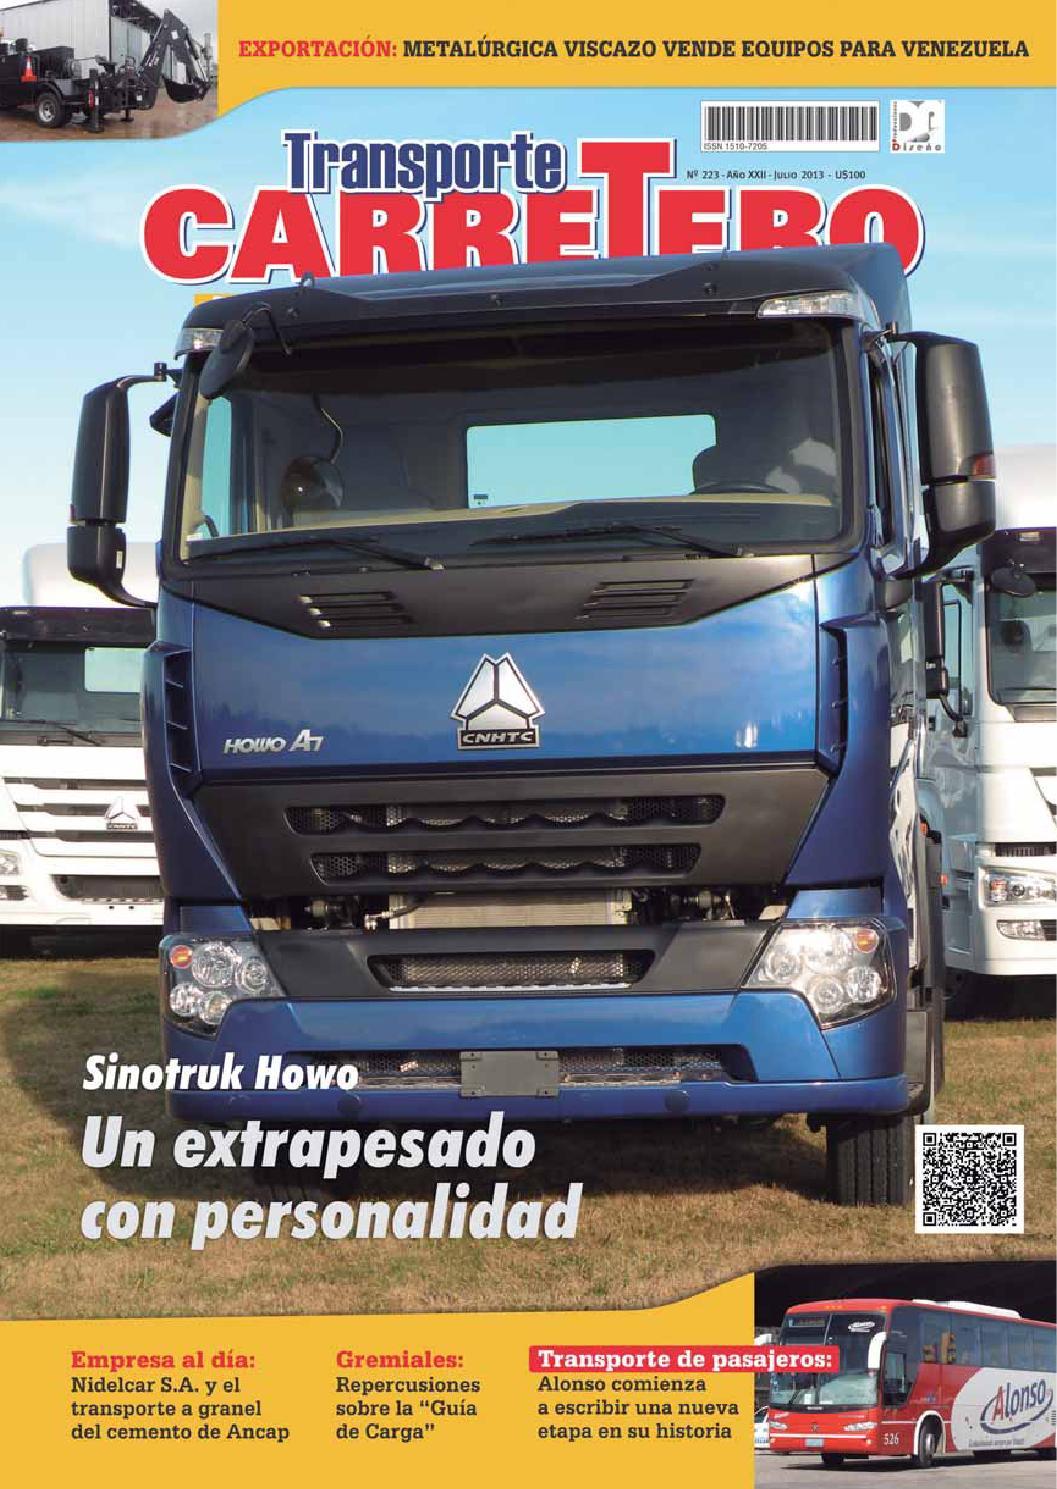 Transporte Carretero Nº 223 - julio 2013 by Diseño Producciones - issuu